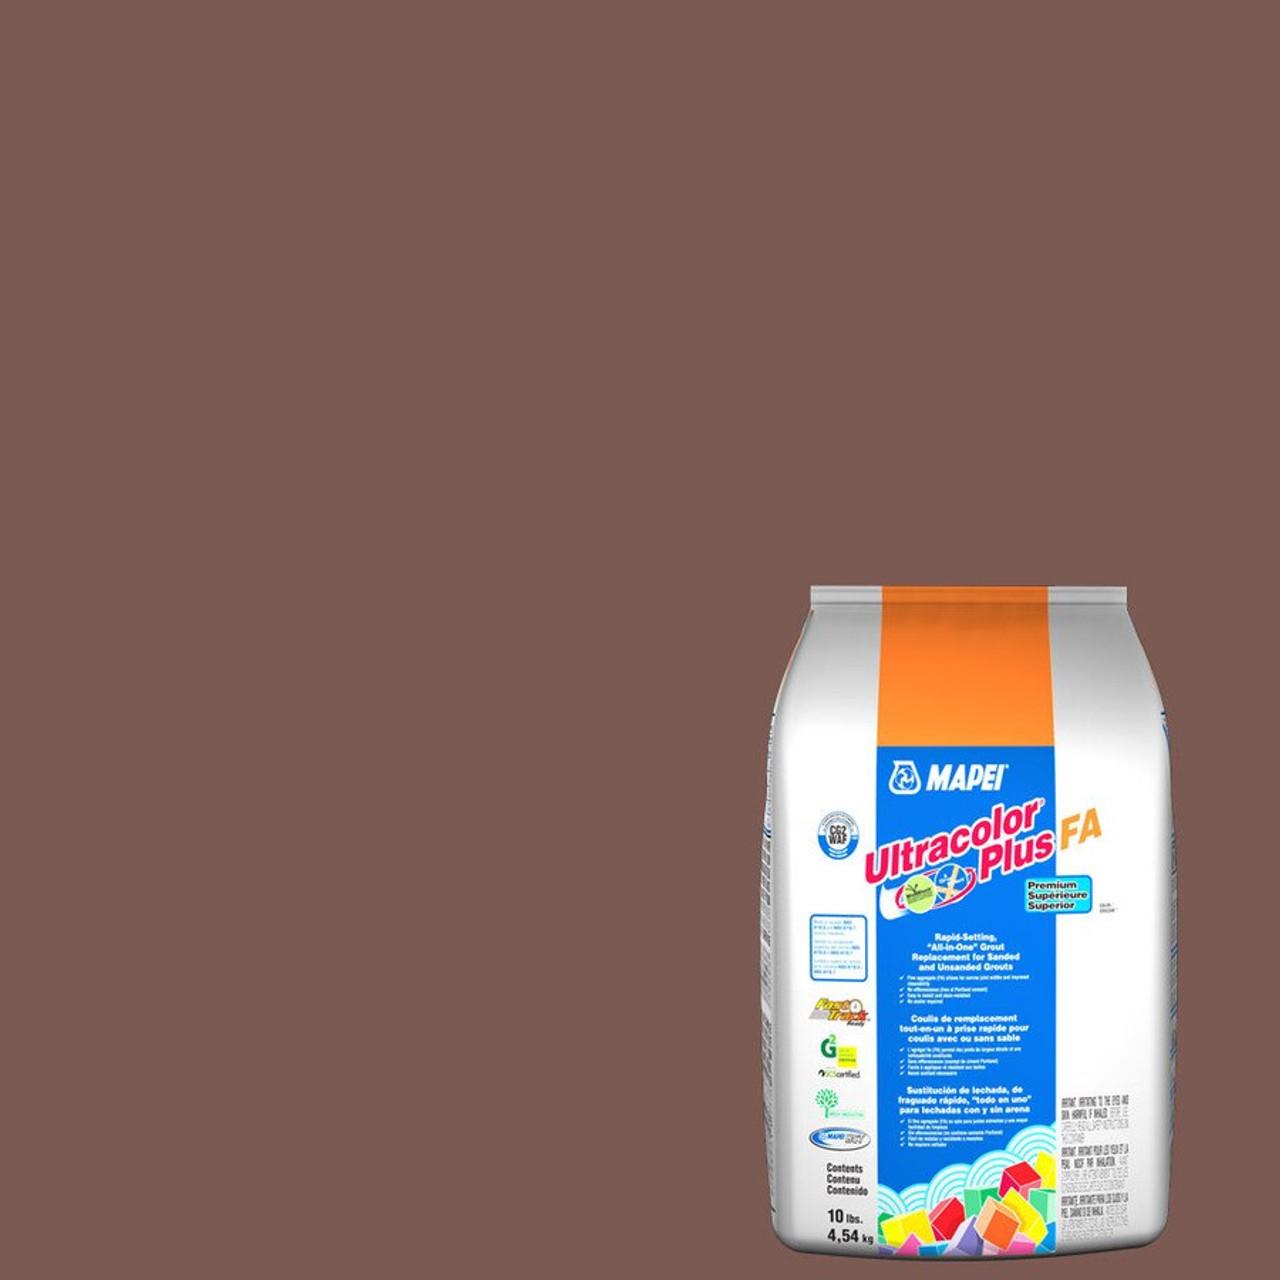 Mapei Mapei Ultracolor Plus FA Grout Brick Red